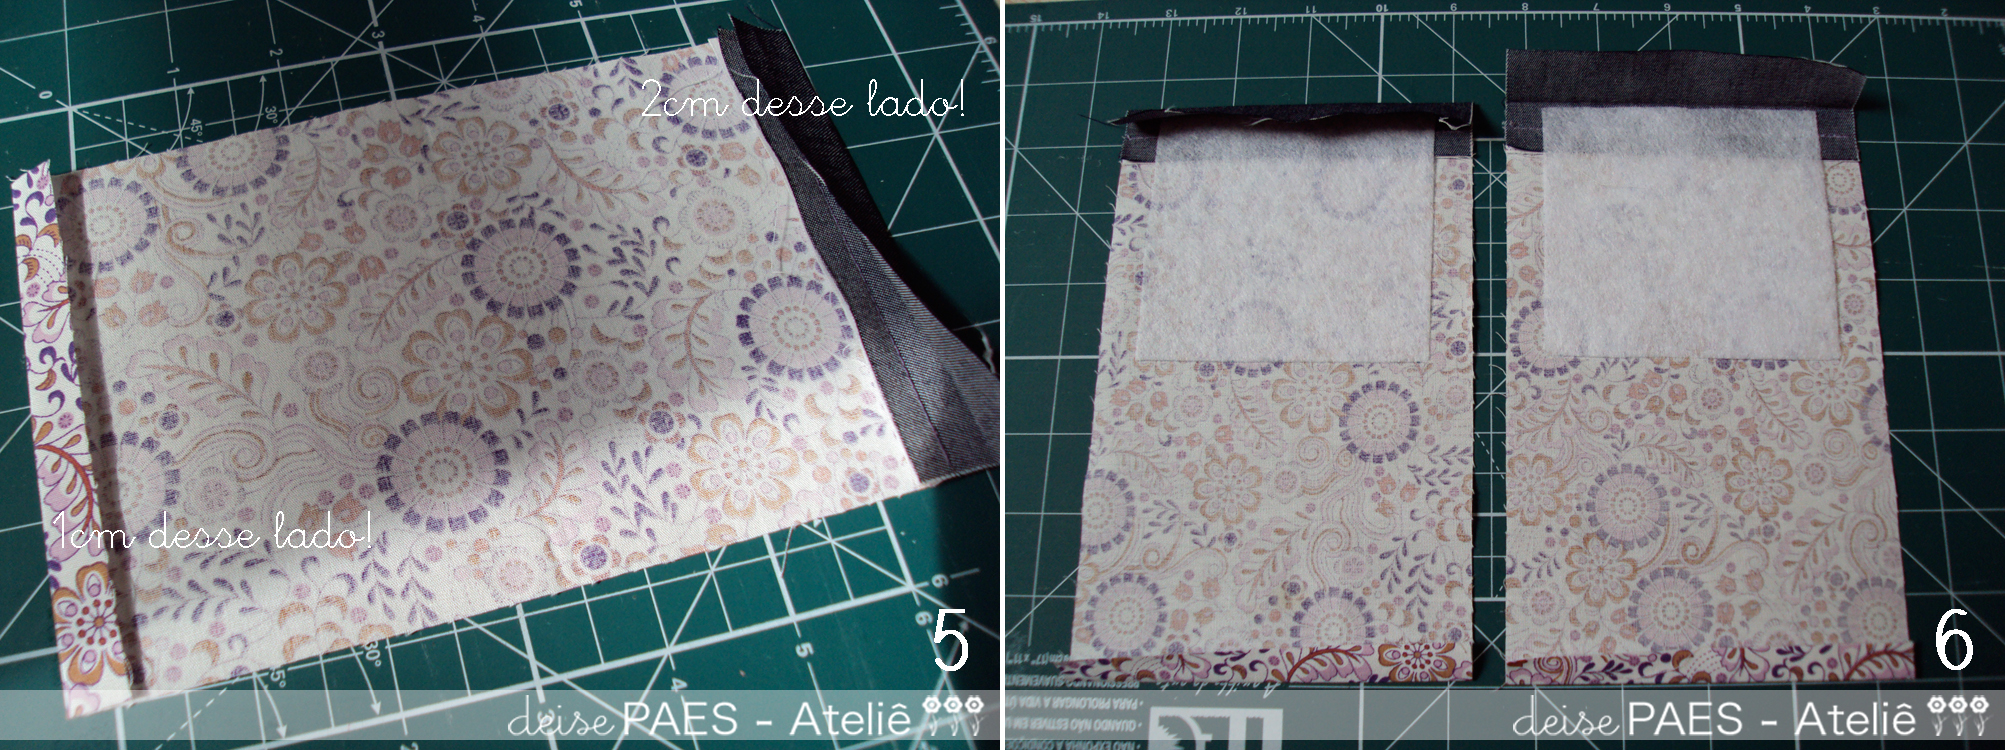 porta-absorventes - 03